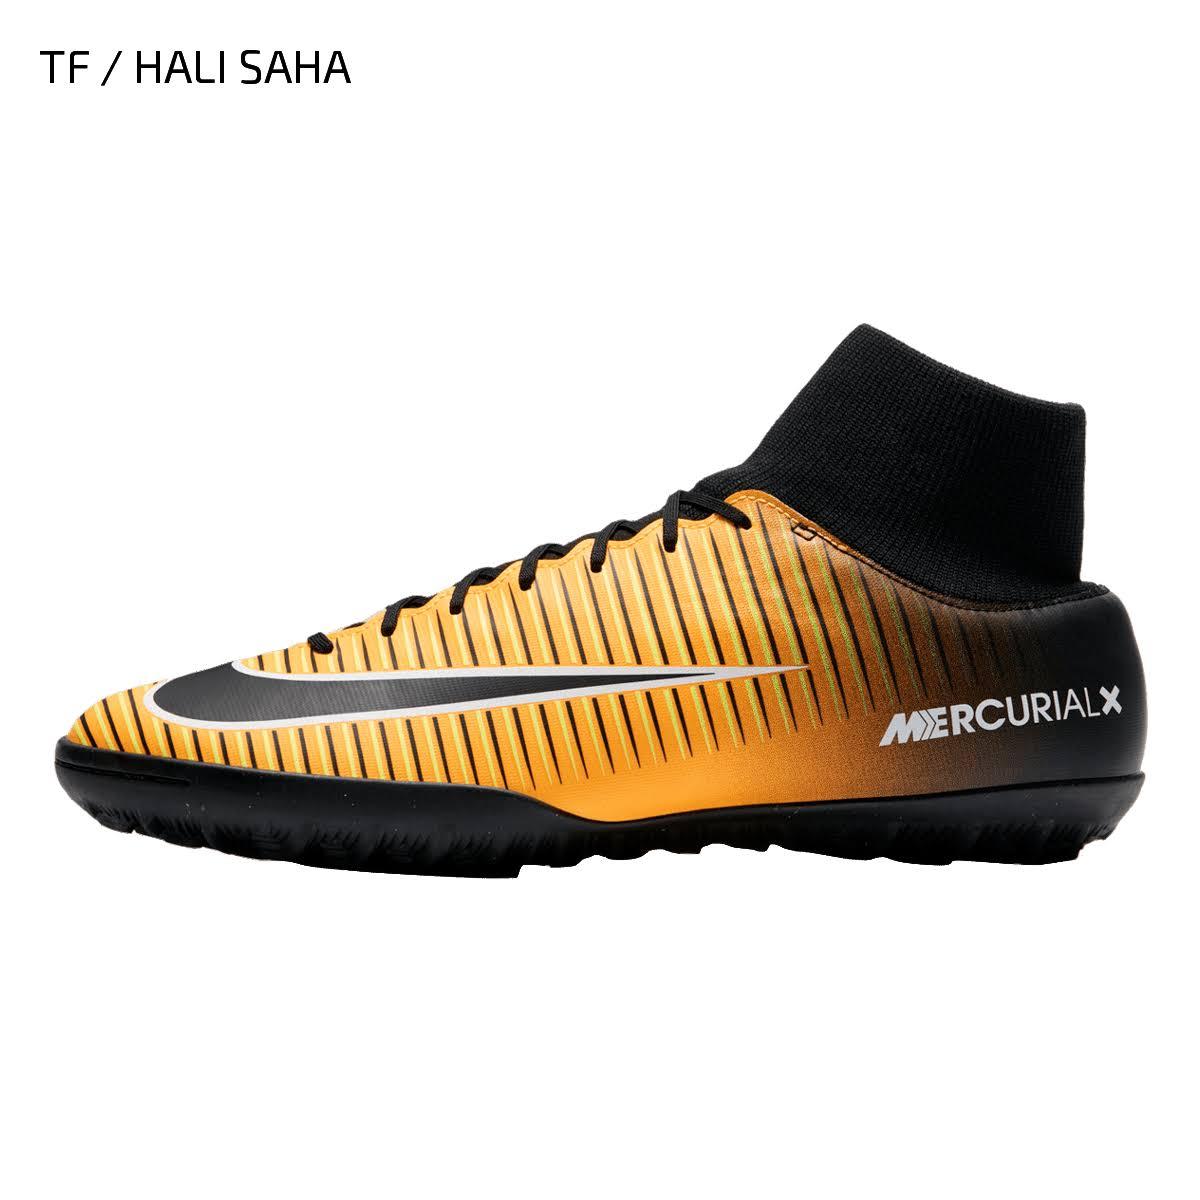 Mercurıalx Nike Erkek 801 Halı Saha Vıctory 903614 UFd1qrFw